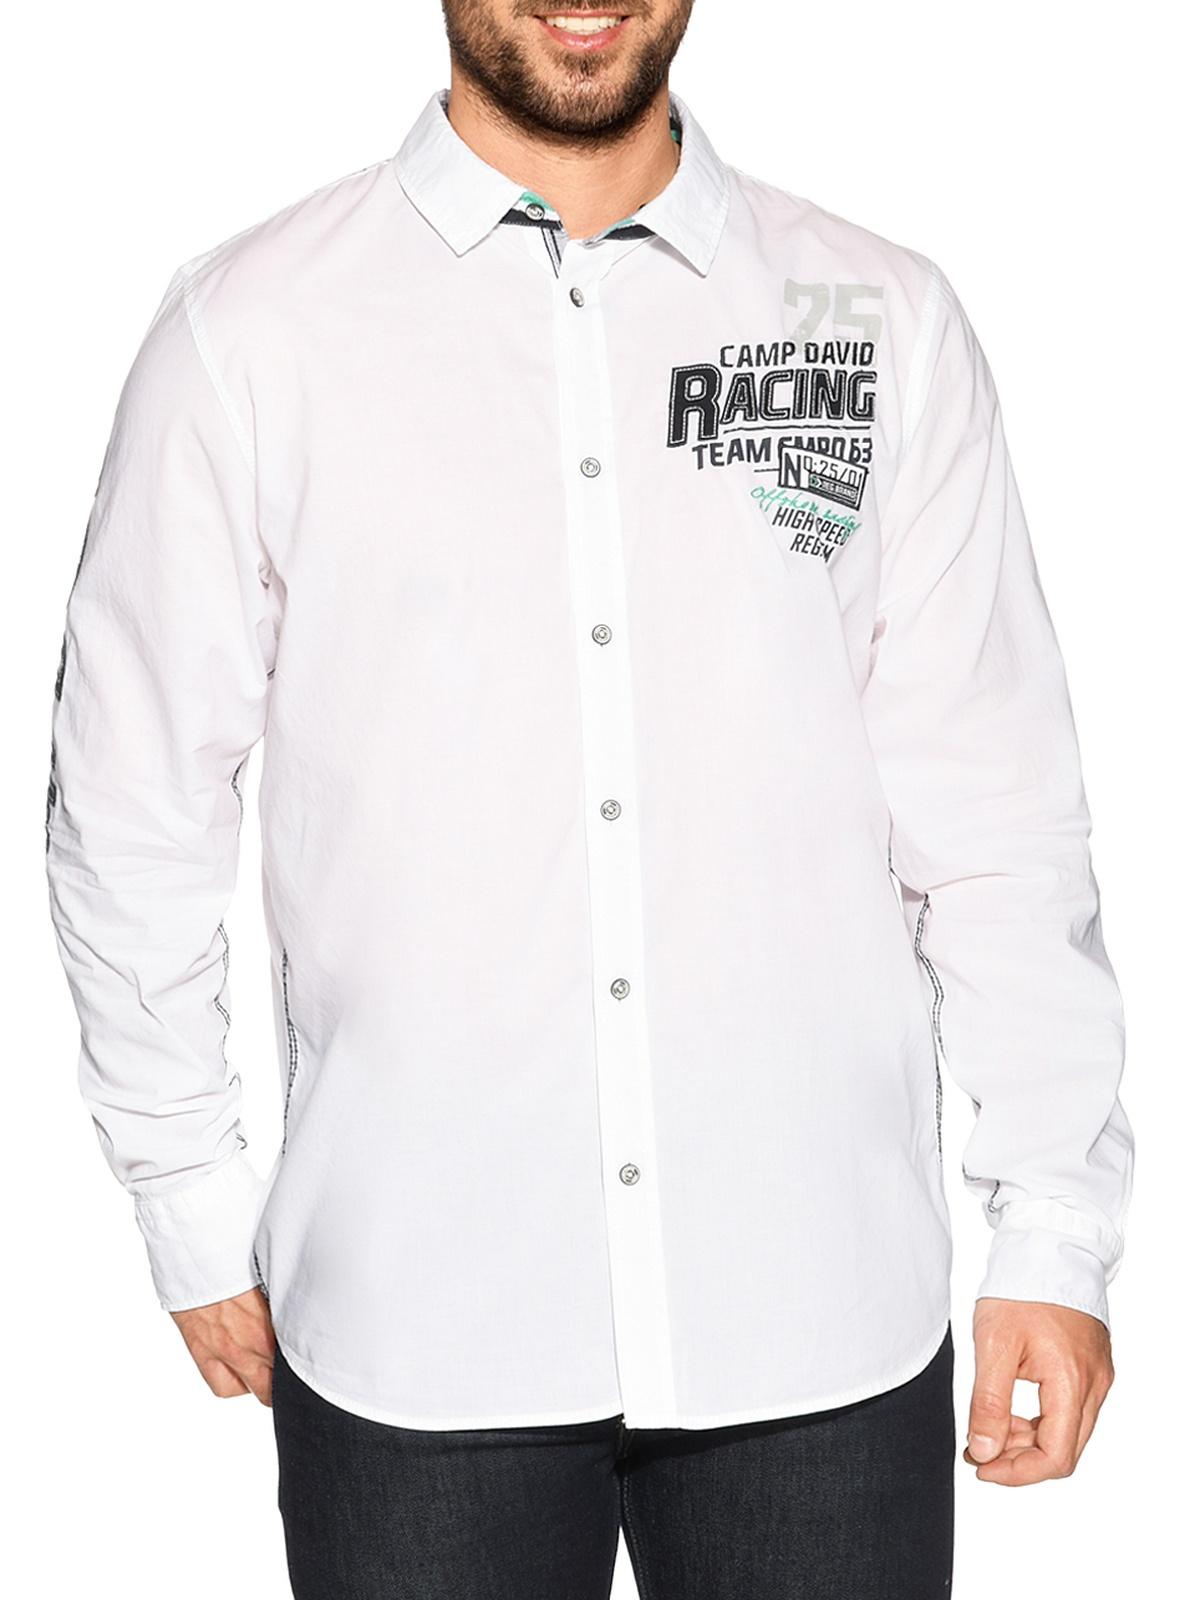 Camp David NCAA Cruiser Mens Premium Short Sleeve Crew Neck Tee